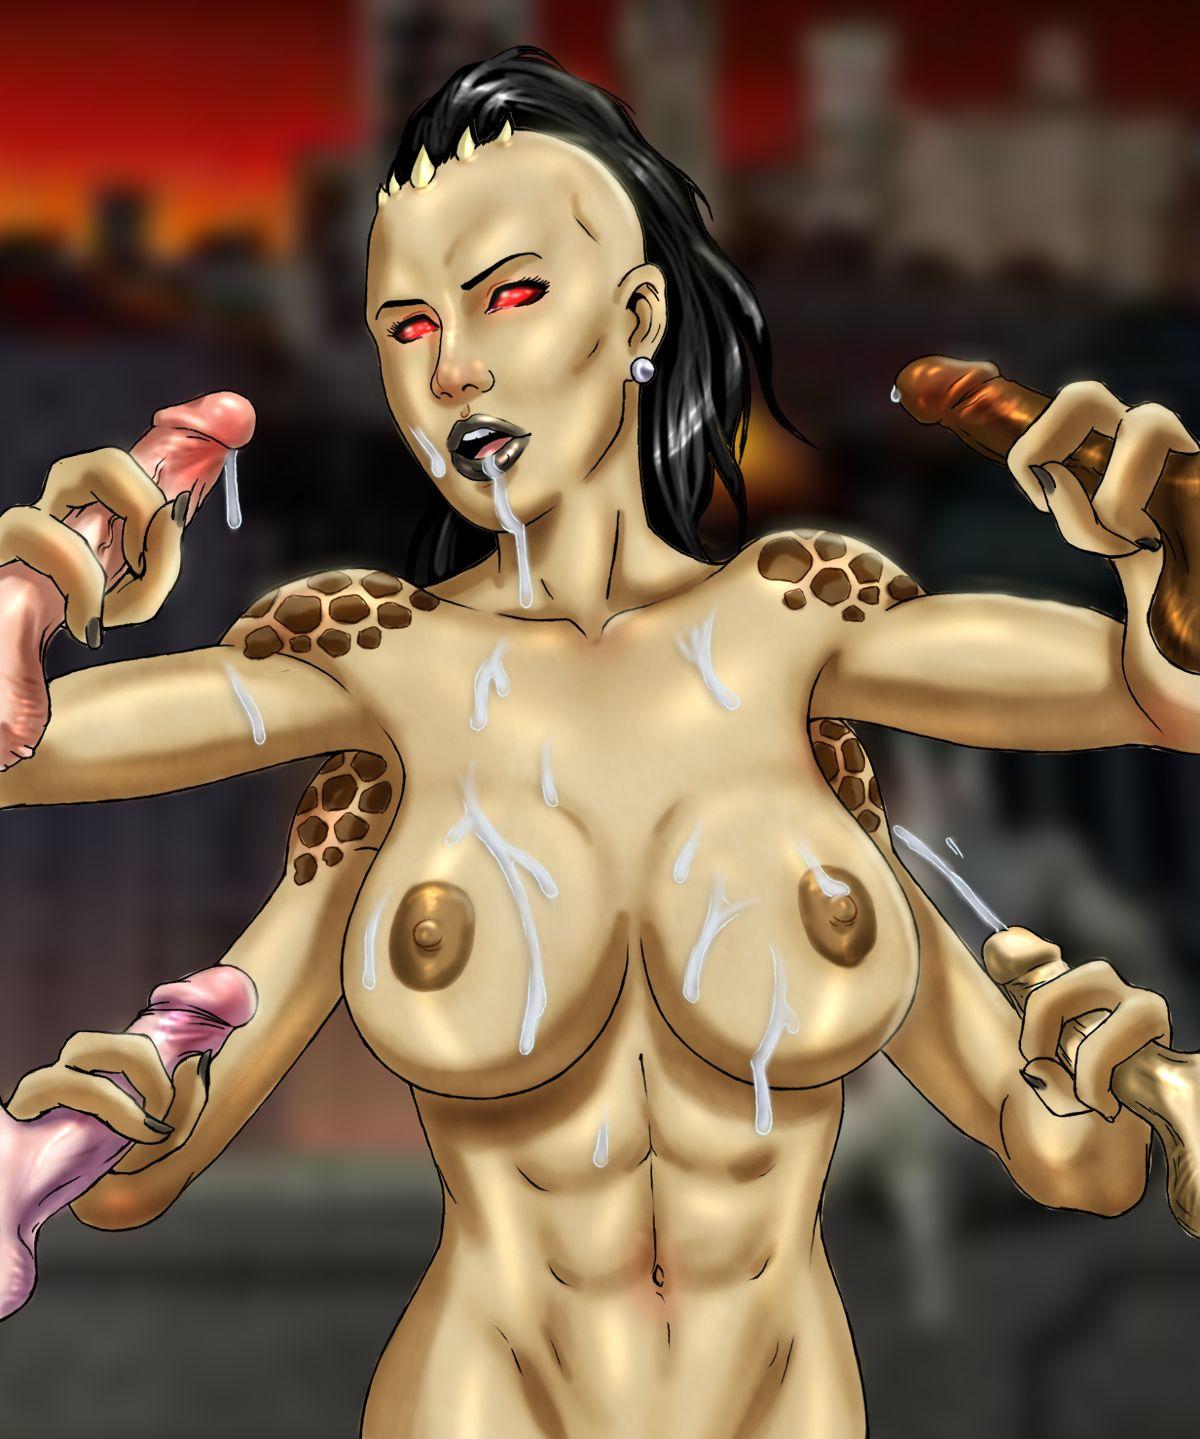 Mortal kombat sheeva hentai porn image